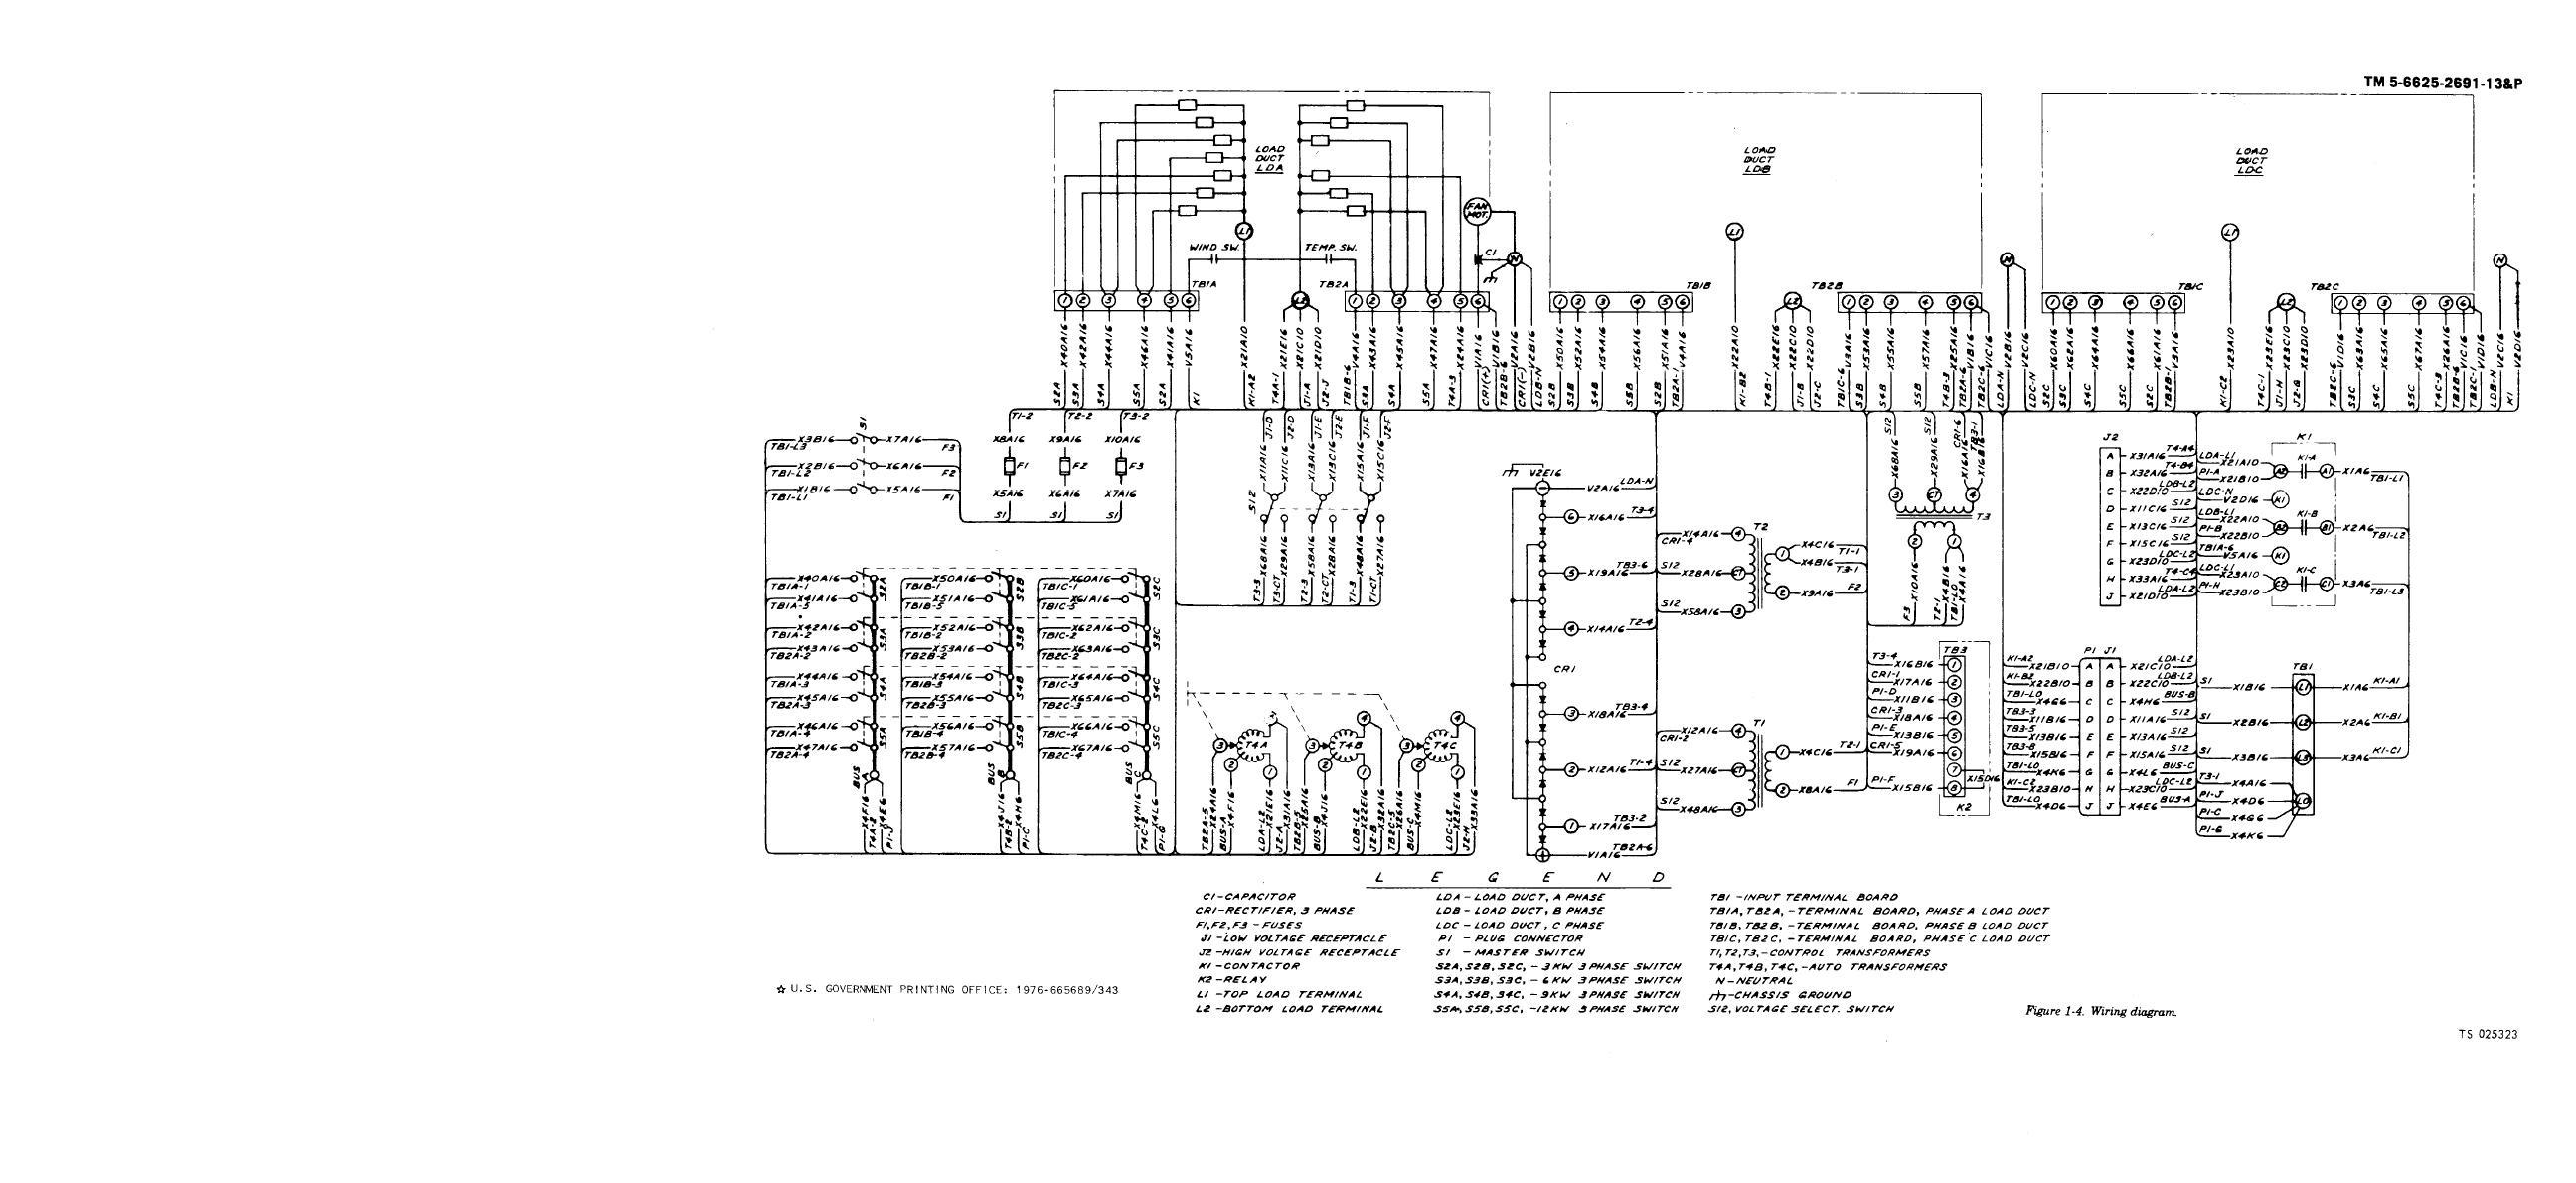 56785 Light Bar Wiring Help Please besides TM 9 4120 367 14 342 moreover Split System Heat Pump Wiring Diagram together with TM 5 4120 377 14 175 also TM 55 1905 223 24 170071. on automotive wiring diagram fundamentals